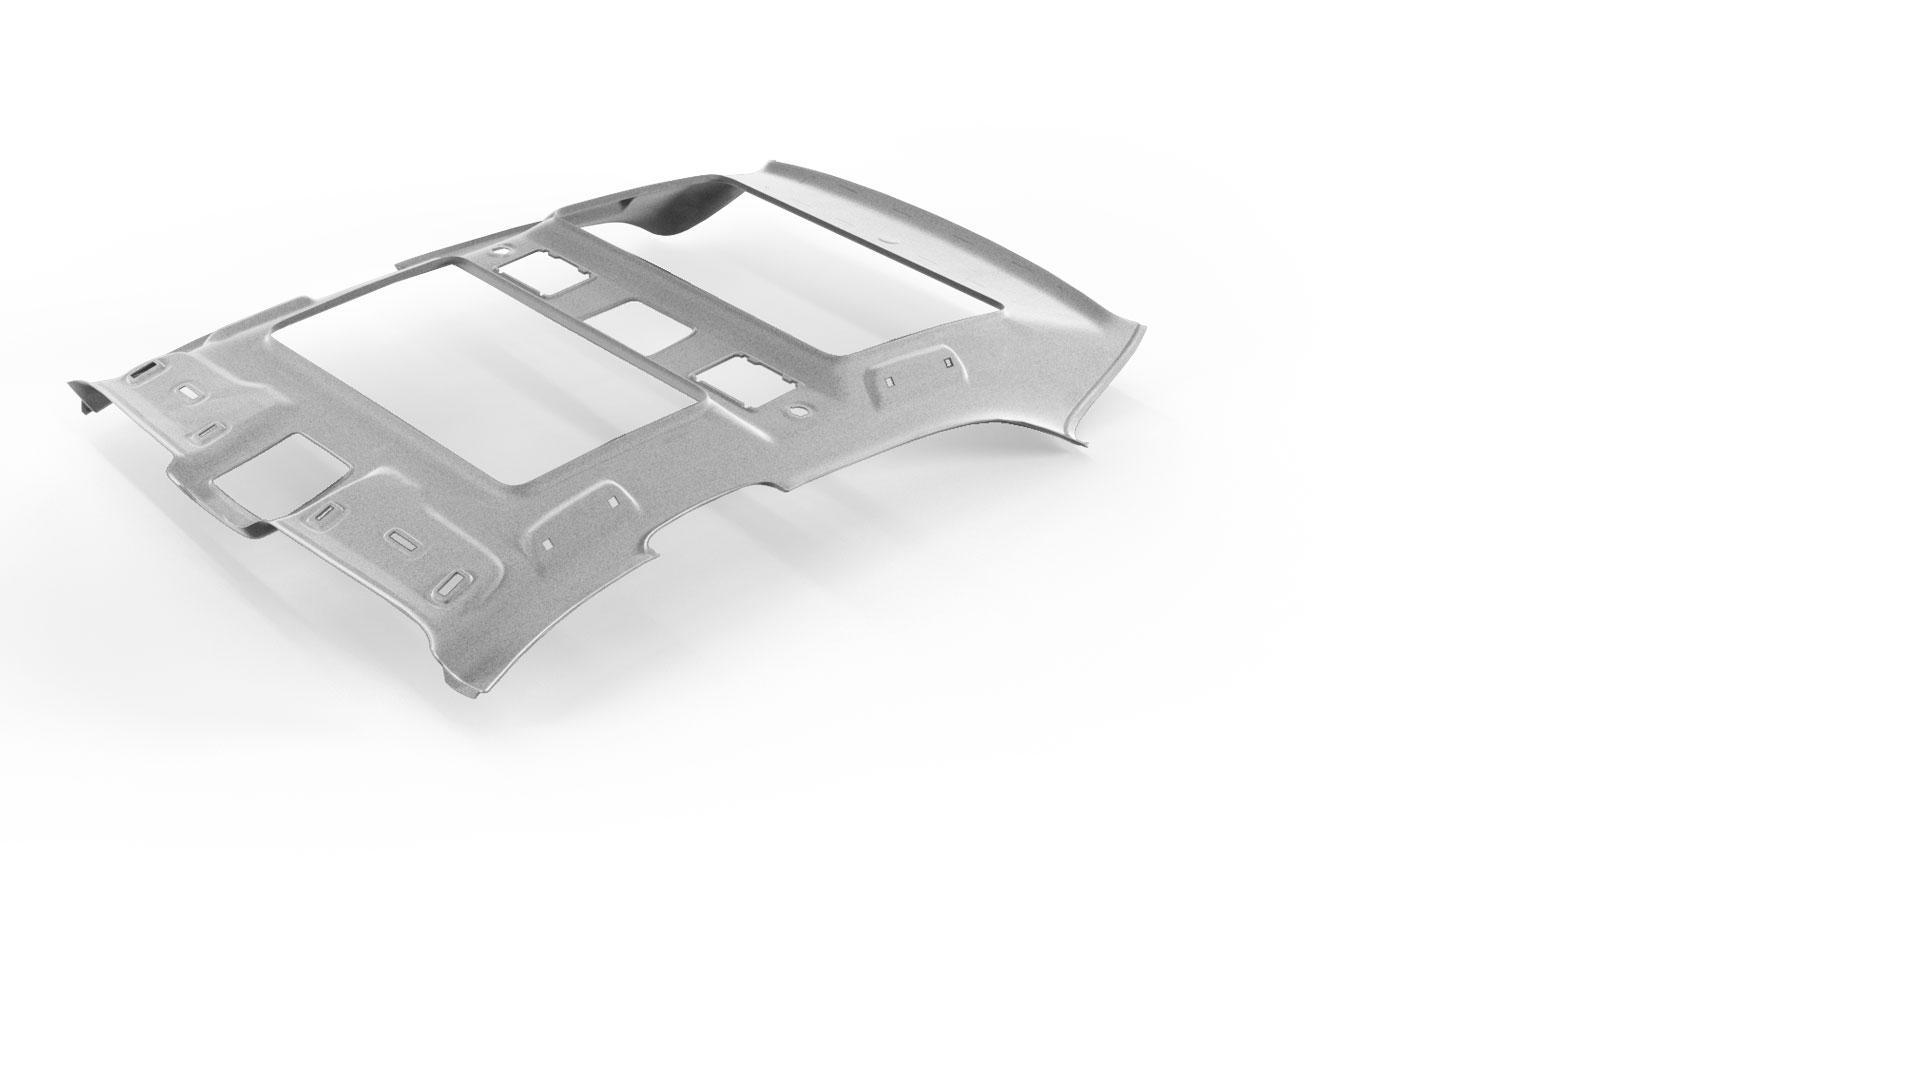 automotive-headliner-molds-and-tools-ennegi